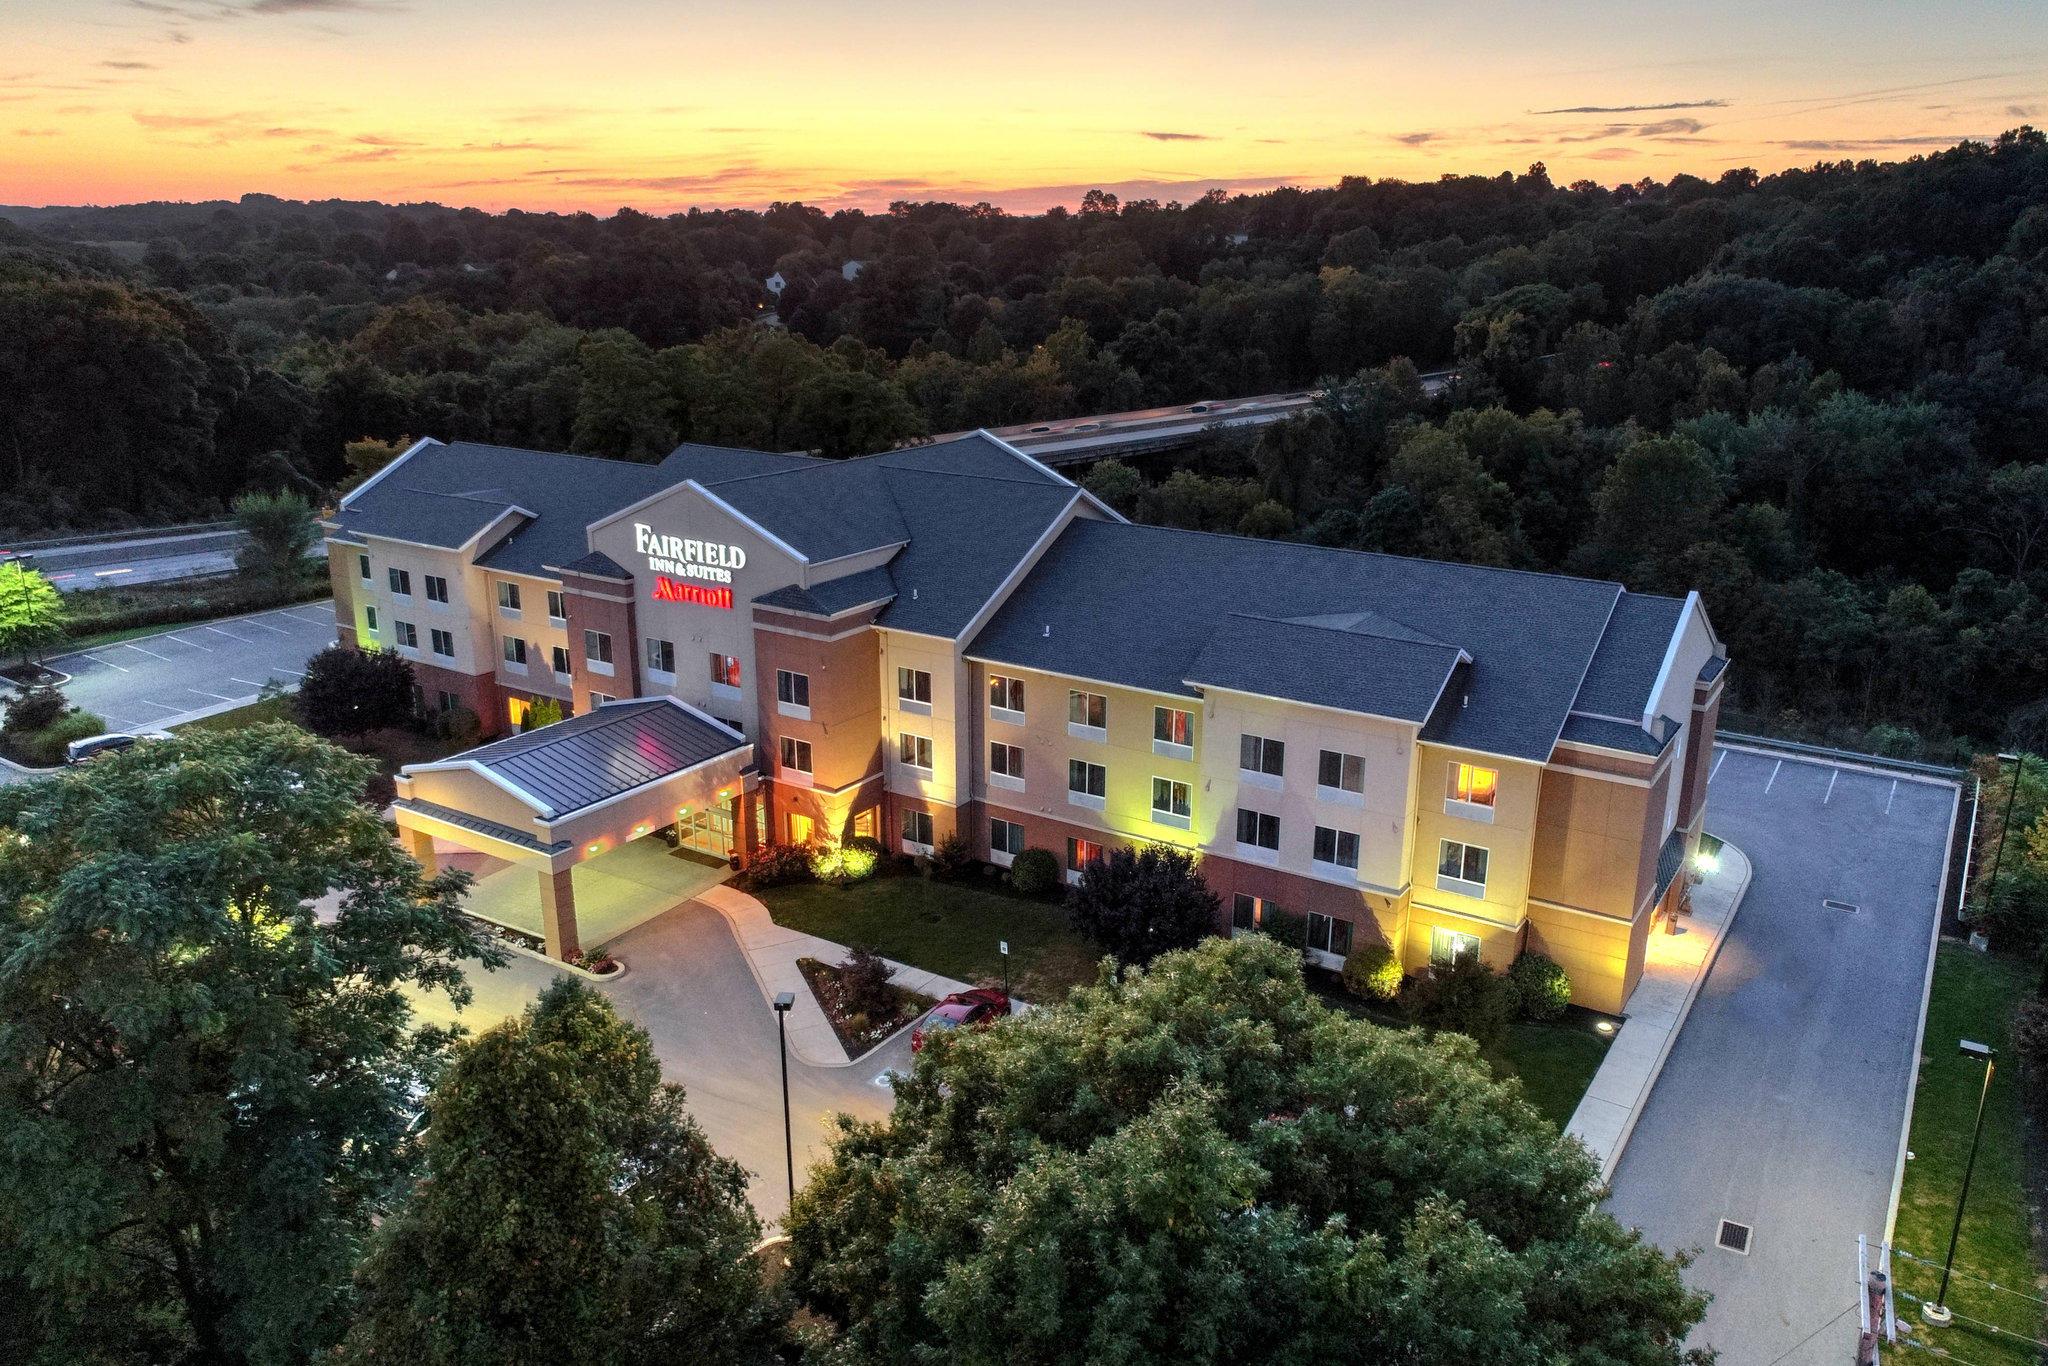 Fairfield Inn & Suites by Marriott Harrisburg West